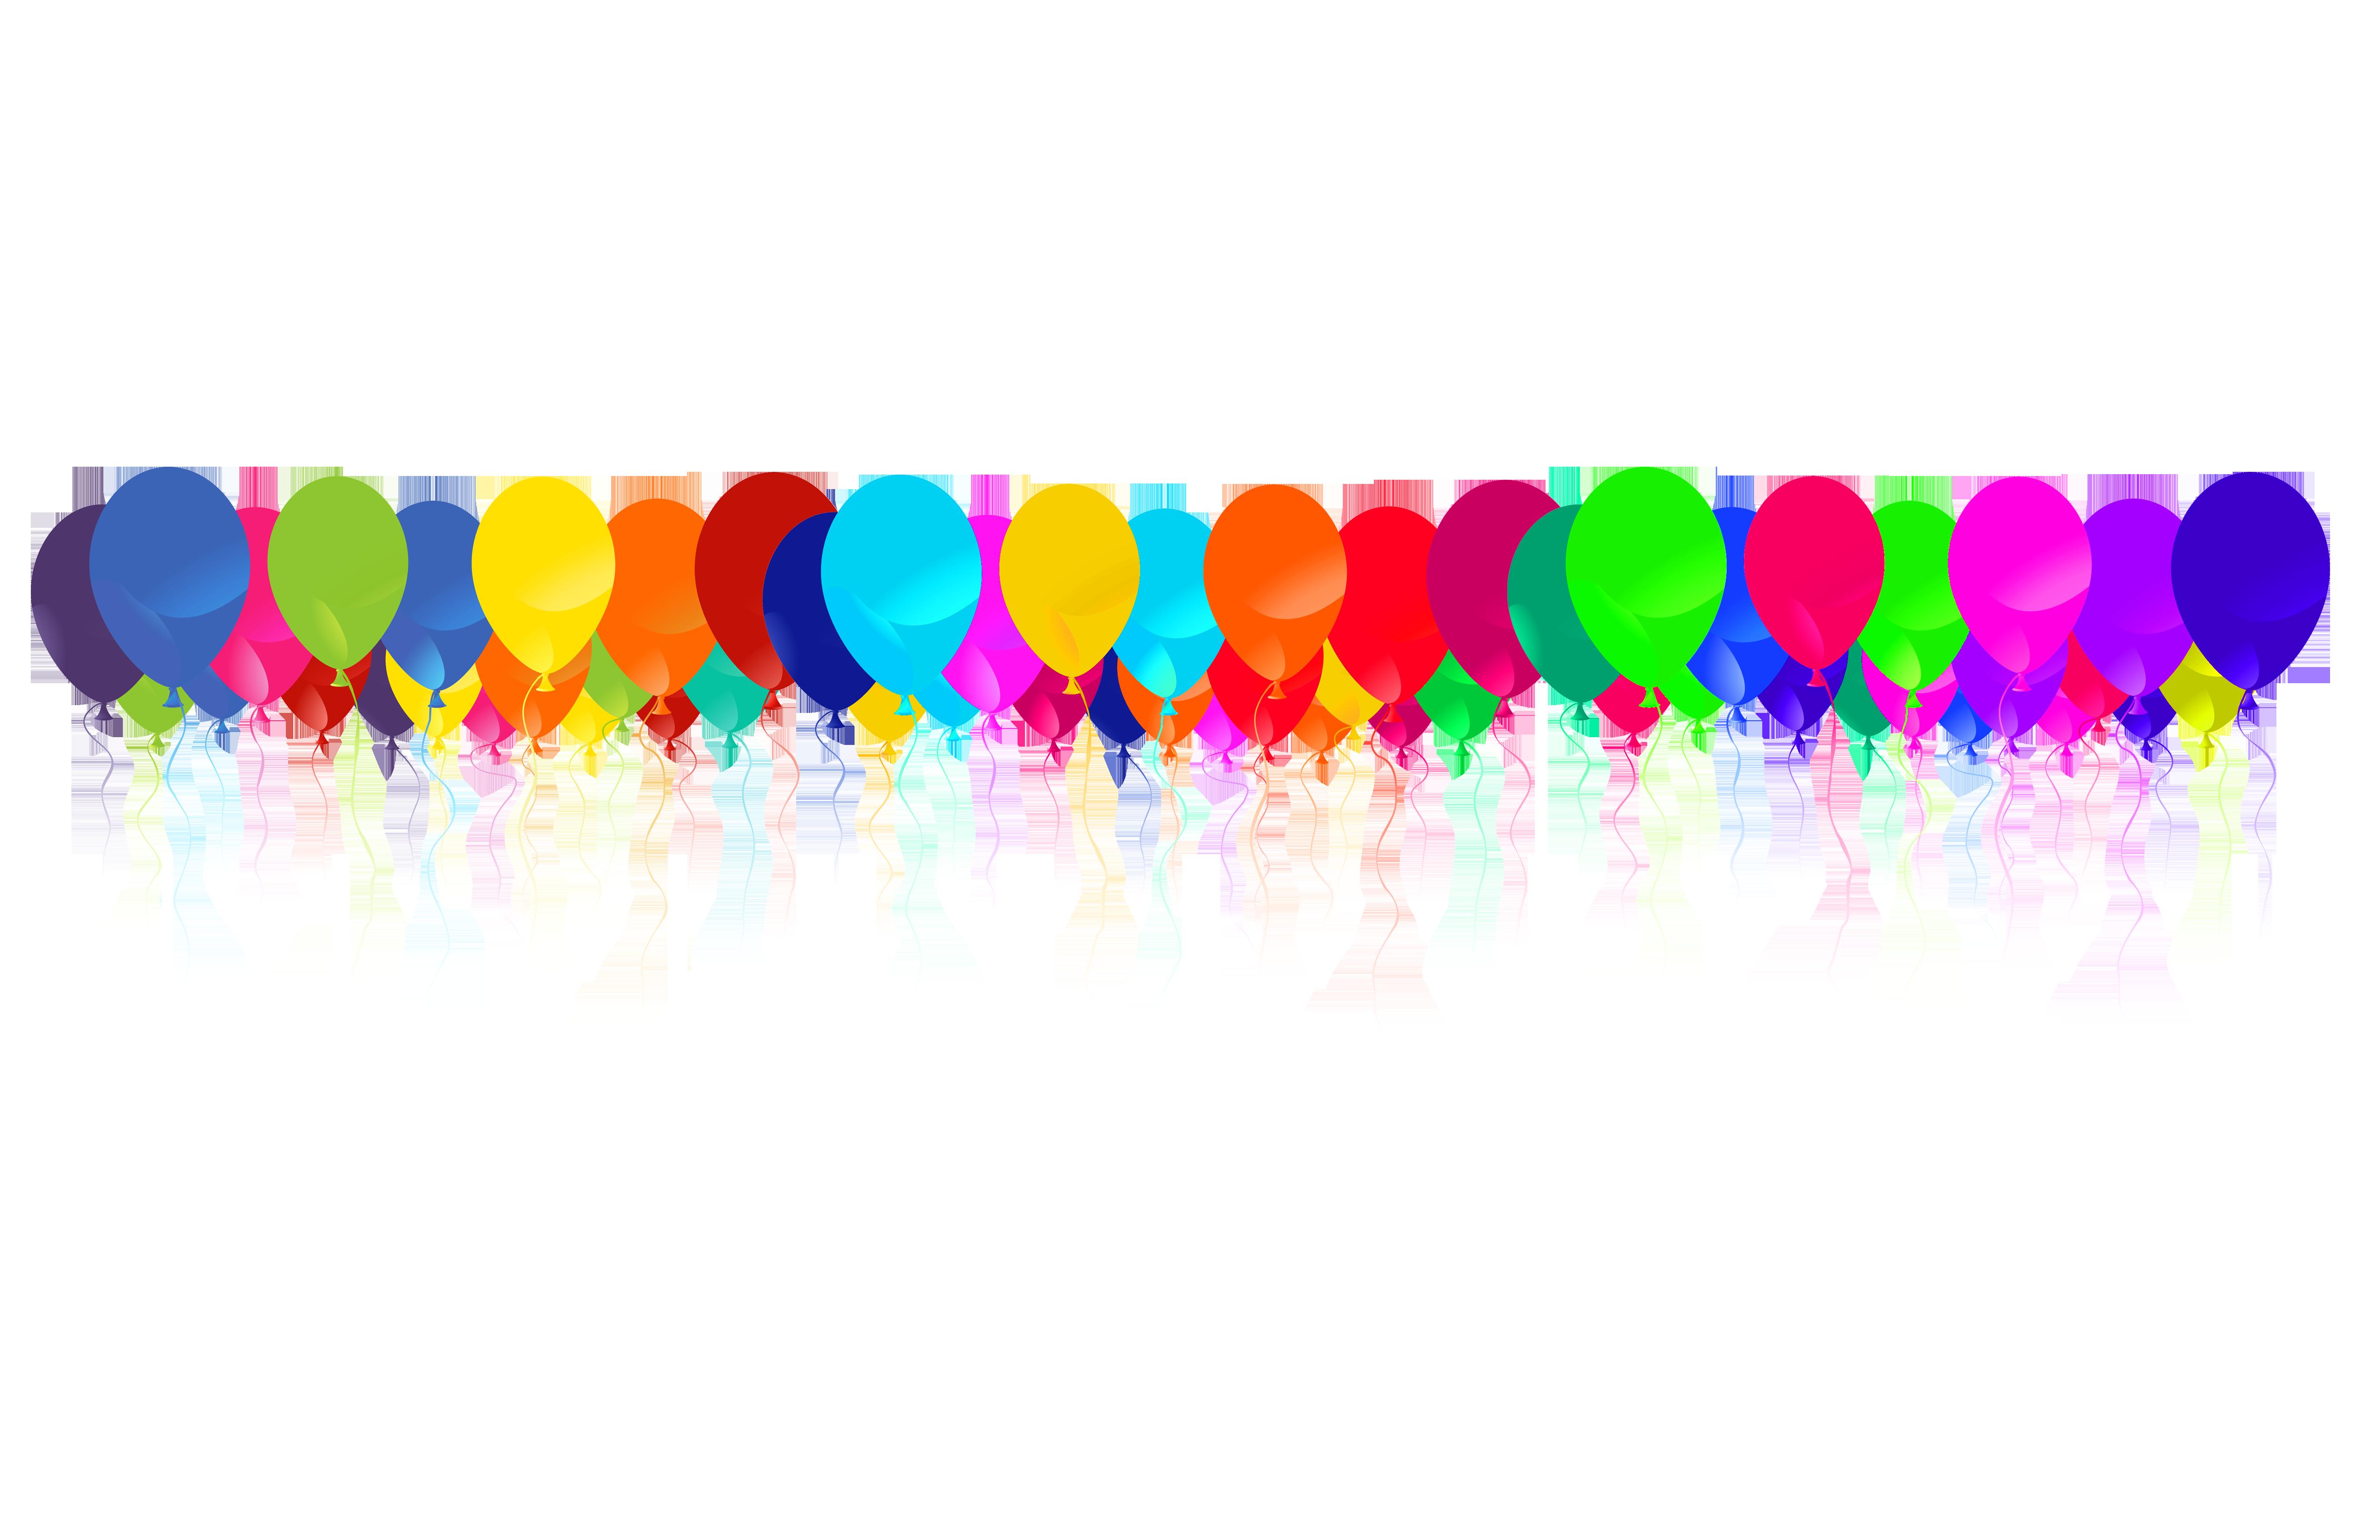 Free Balloons Border, Download Free Clip Art, Free Clip Art.